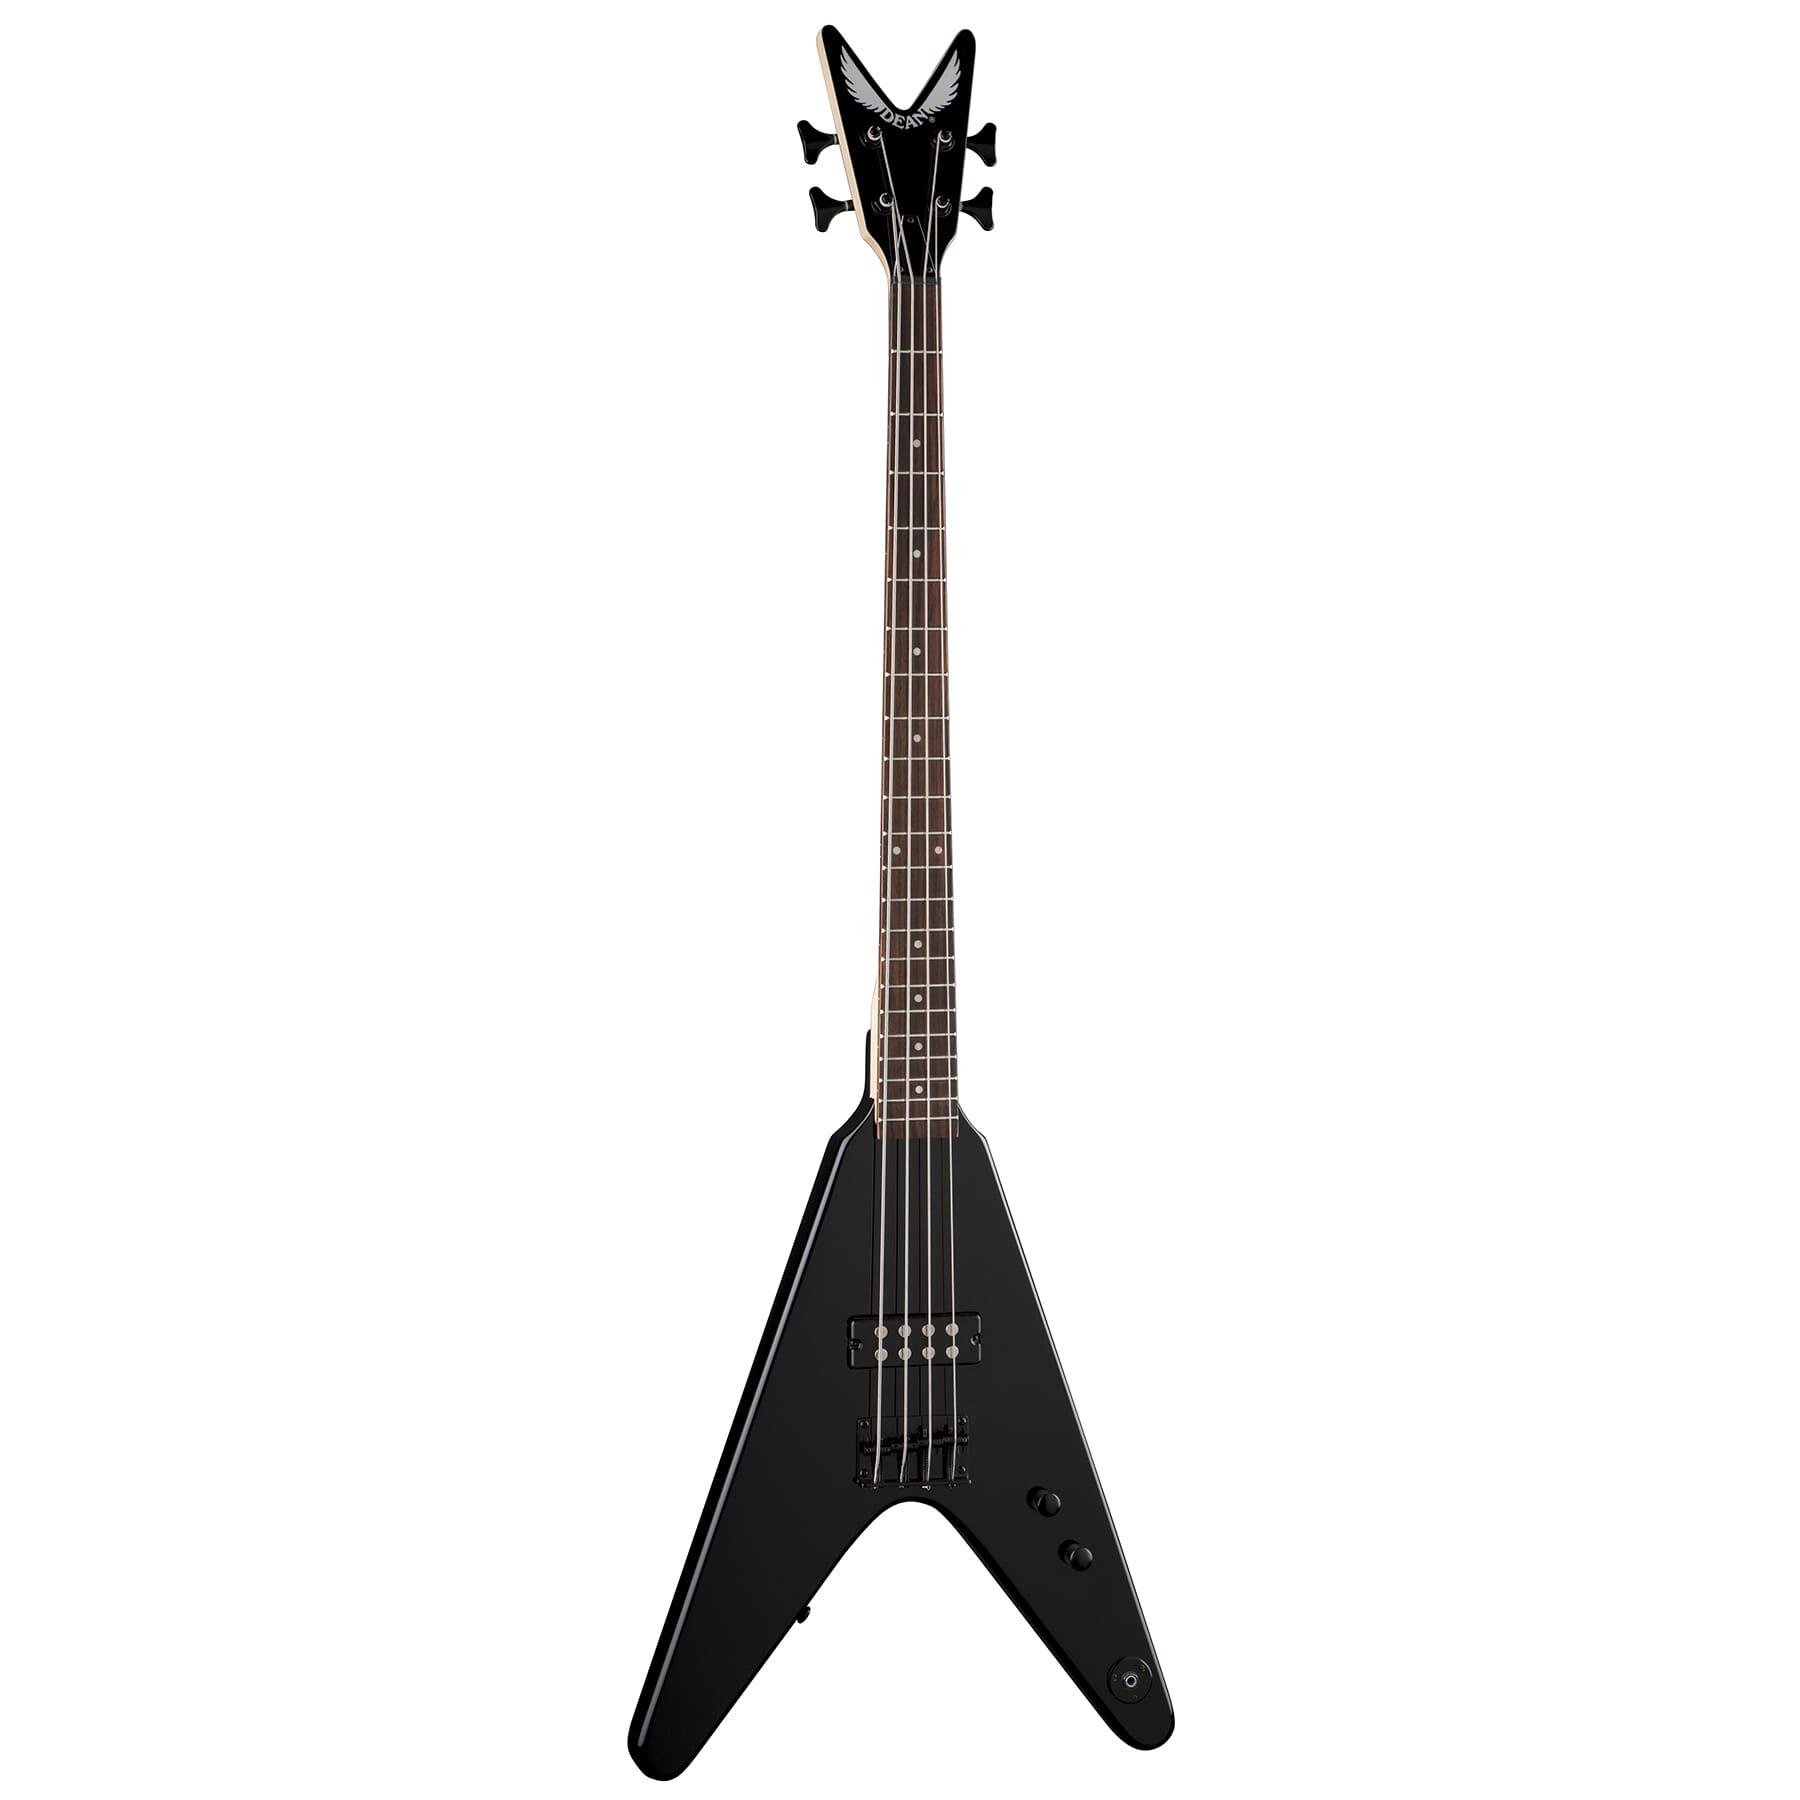 Dean V Metalman-Classic Black Bass